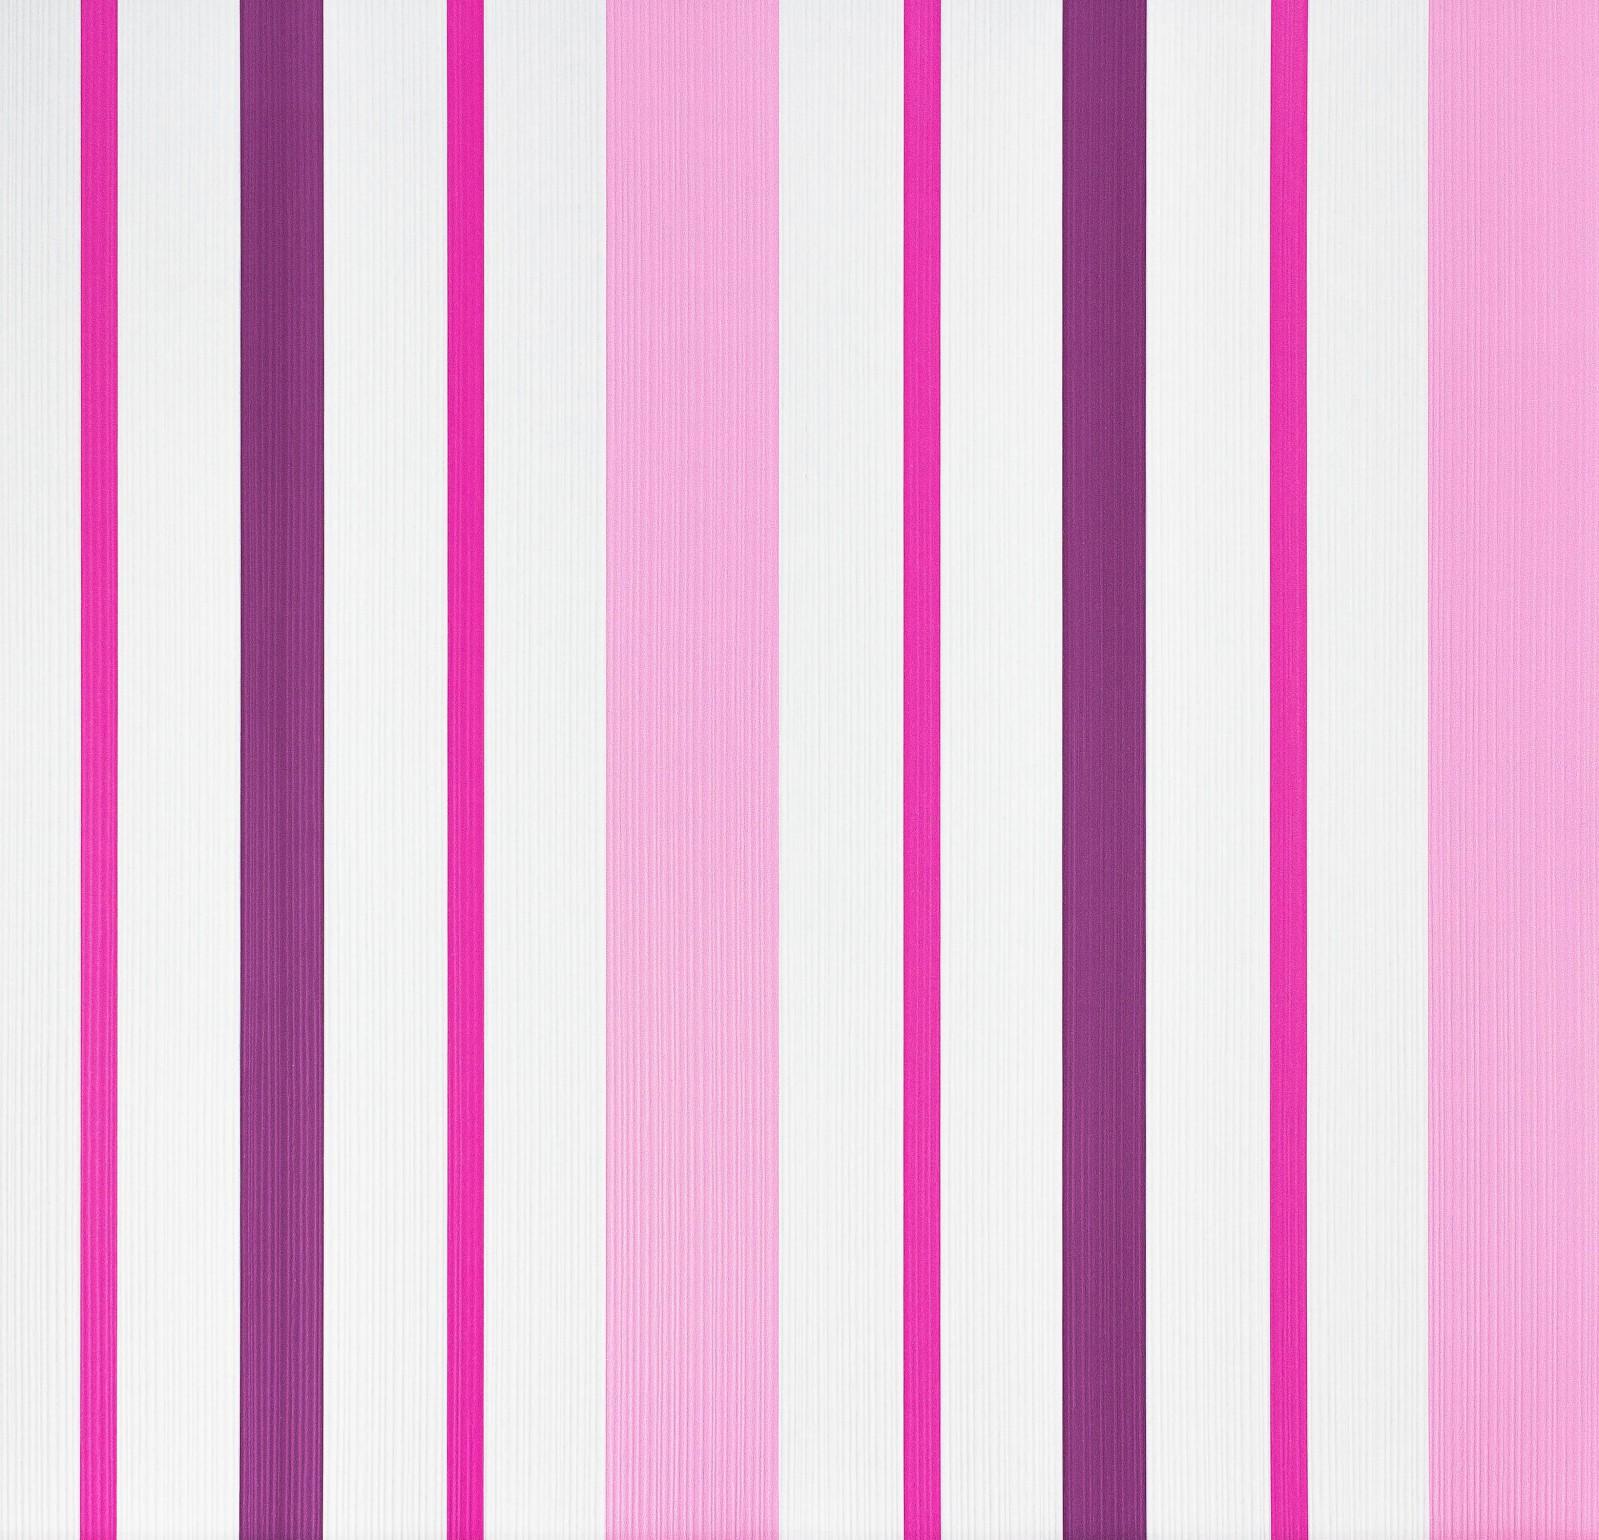 Kids Wallpaper Stripes Boys Girls White 8983 19 001